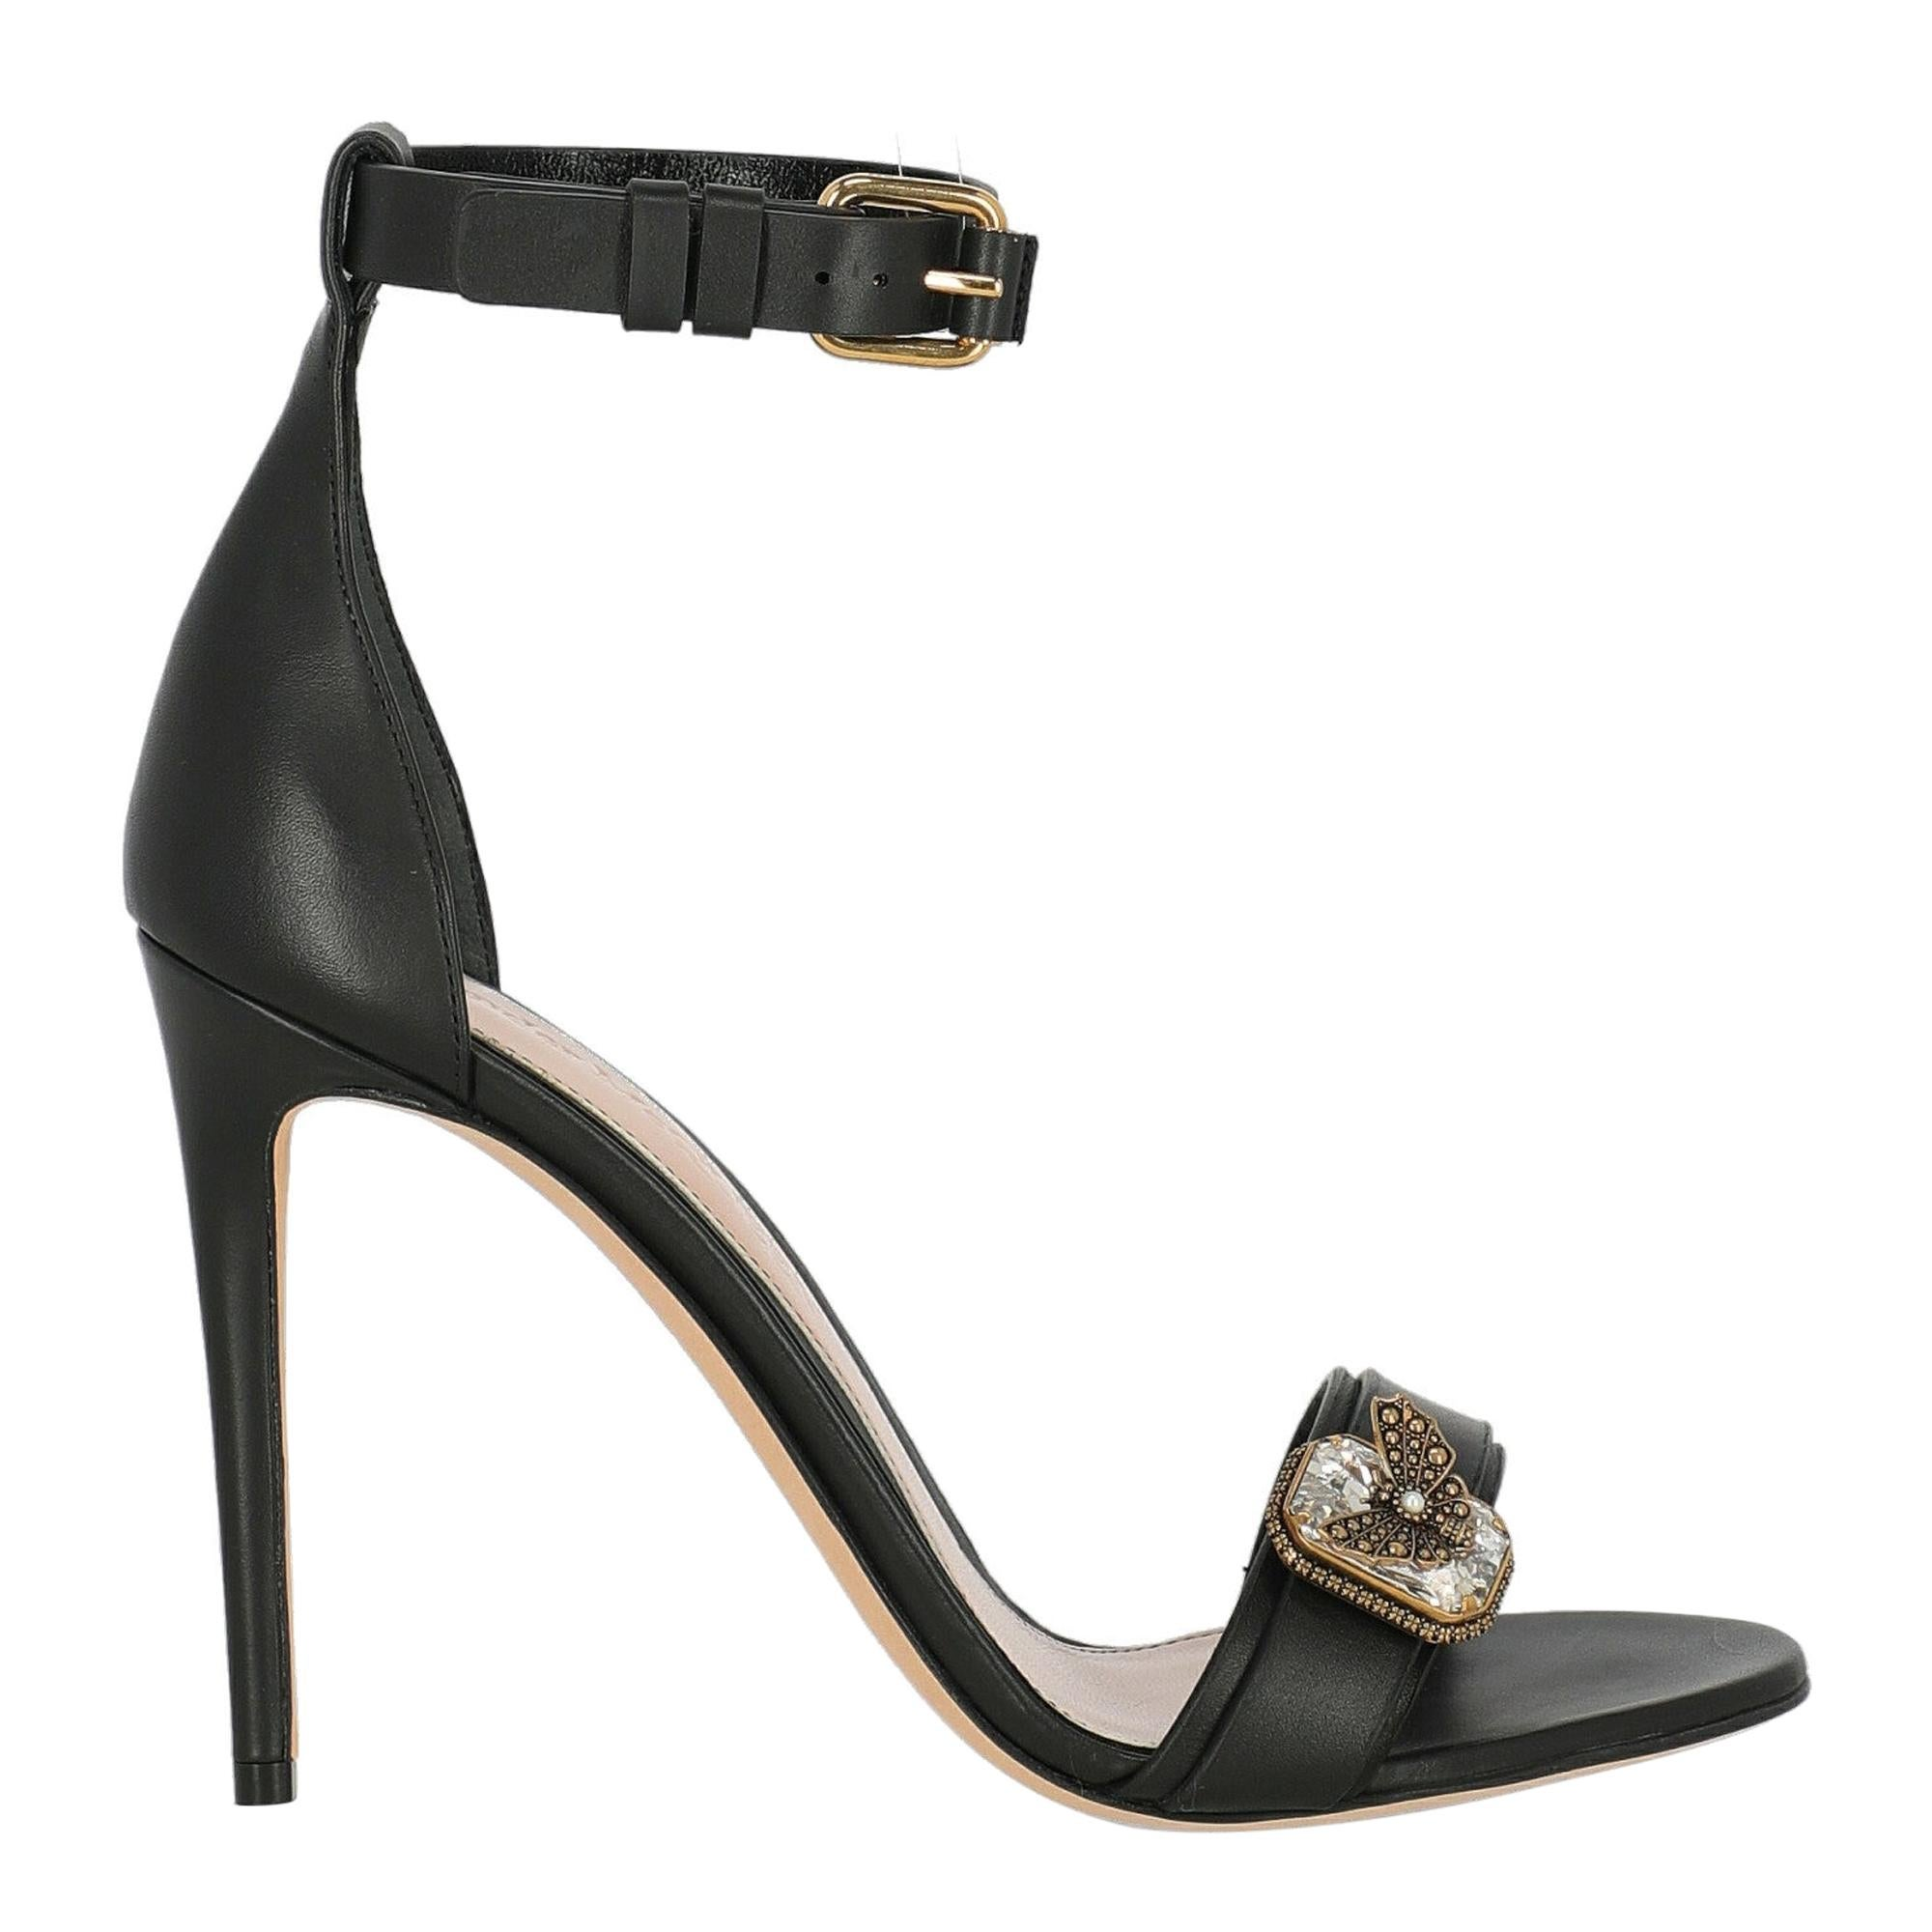 Alexander Mcqueen Woman Sandals Black Leather IT 40